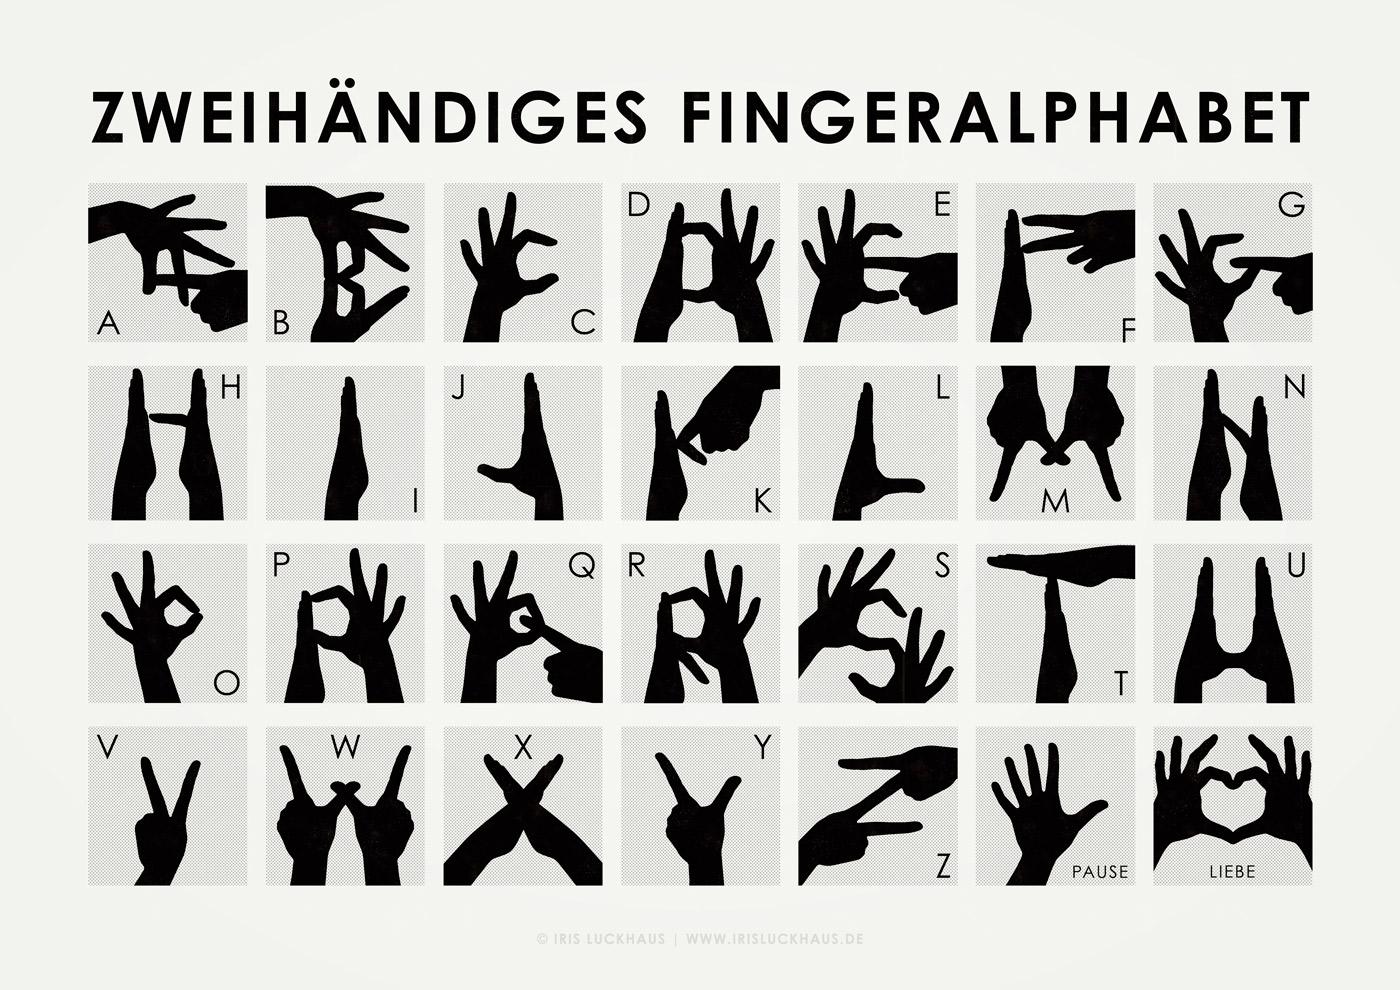 irisluckhaus_alphabet_fingeralphabet_1400